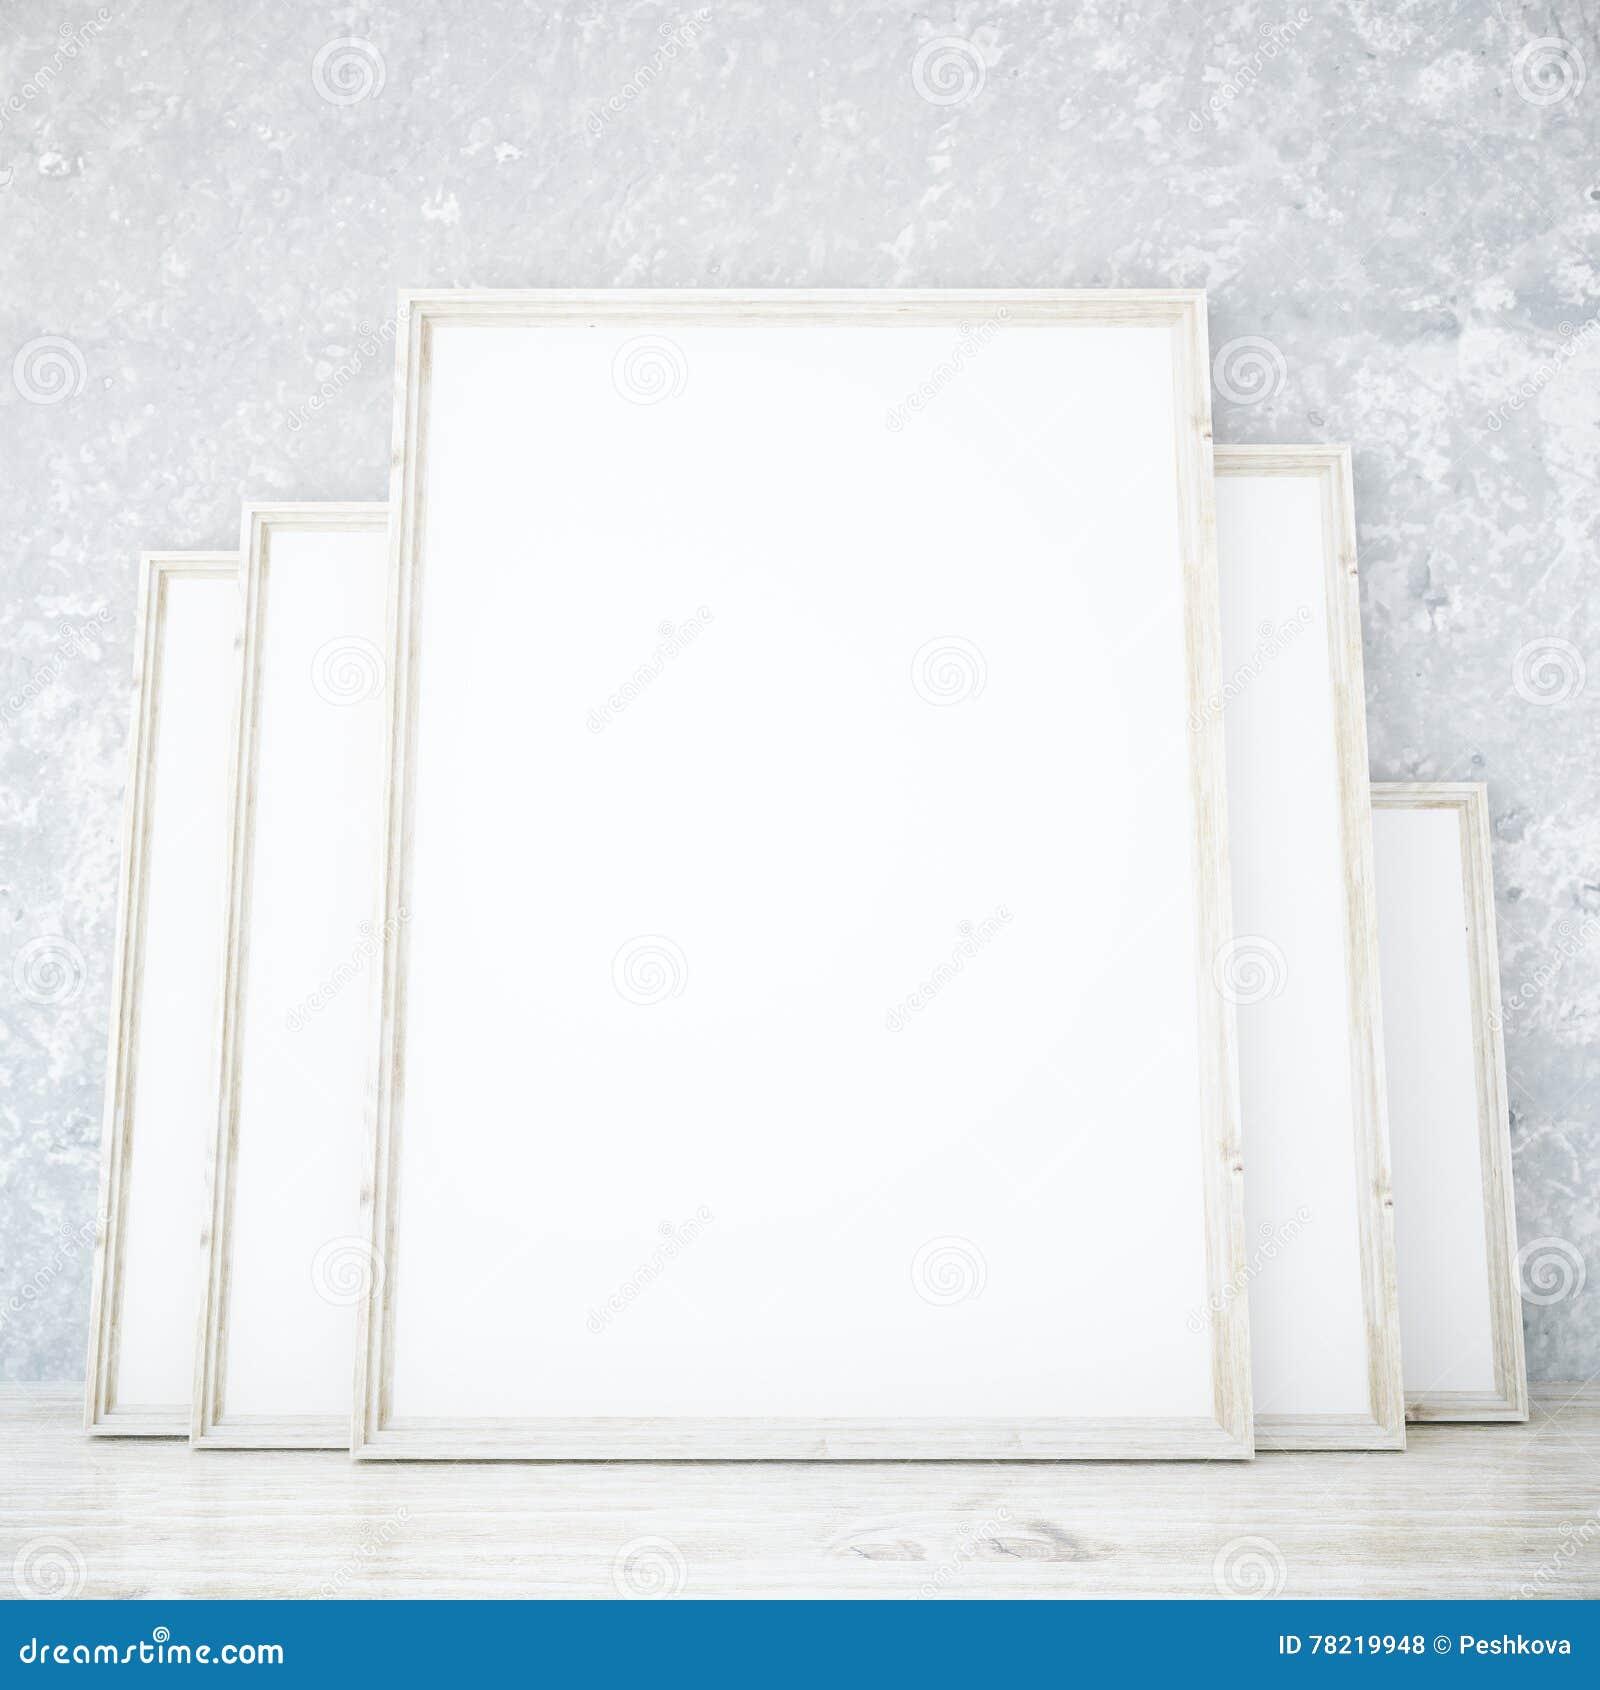 Room with blank frames stock illustration. Illustration of banner ...